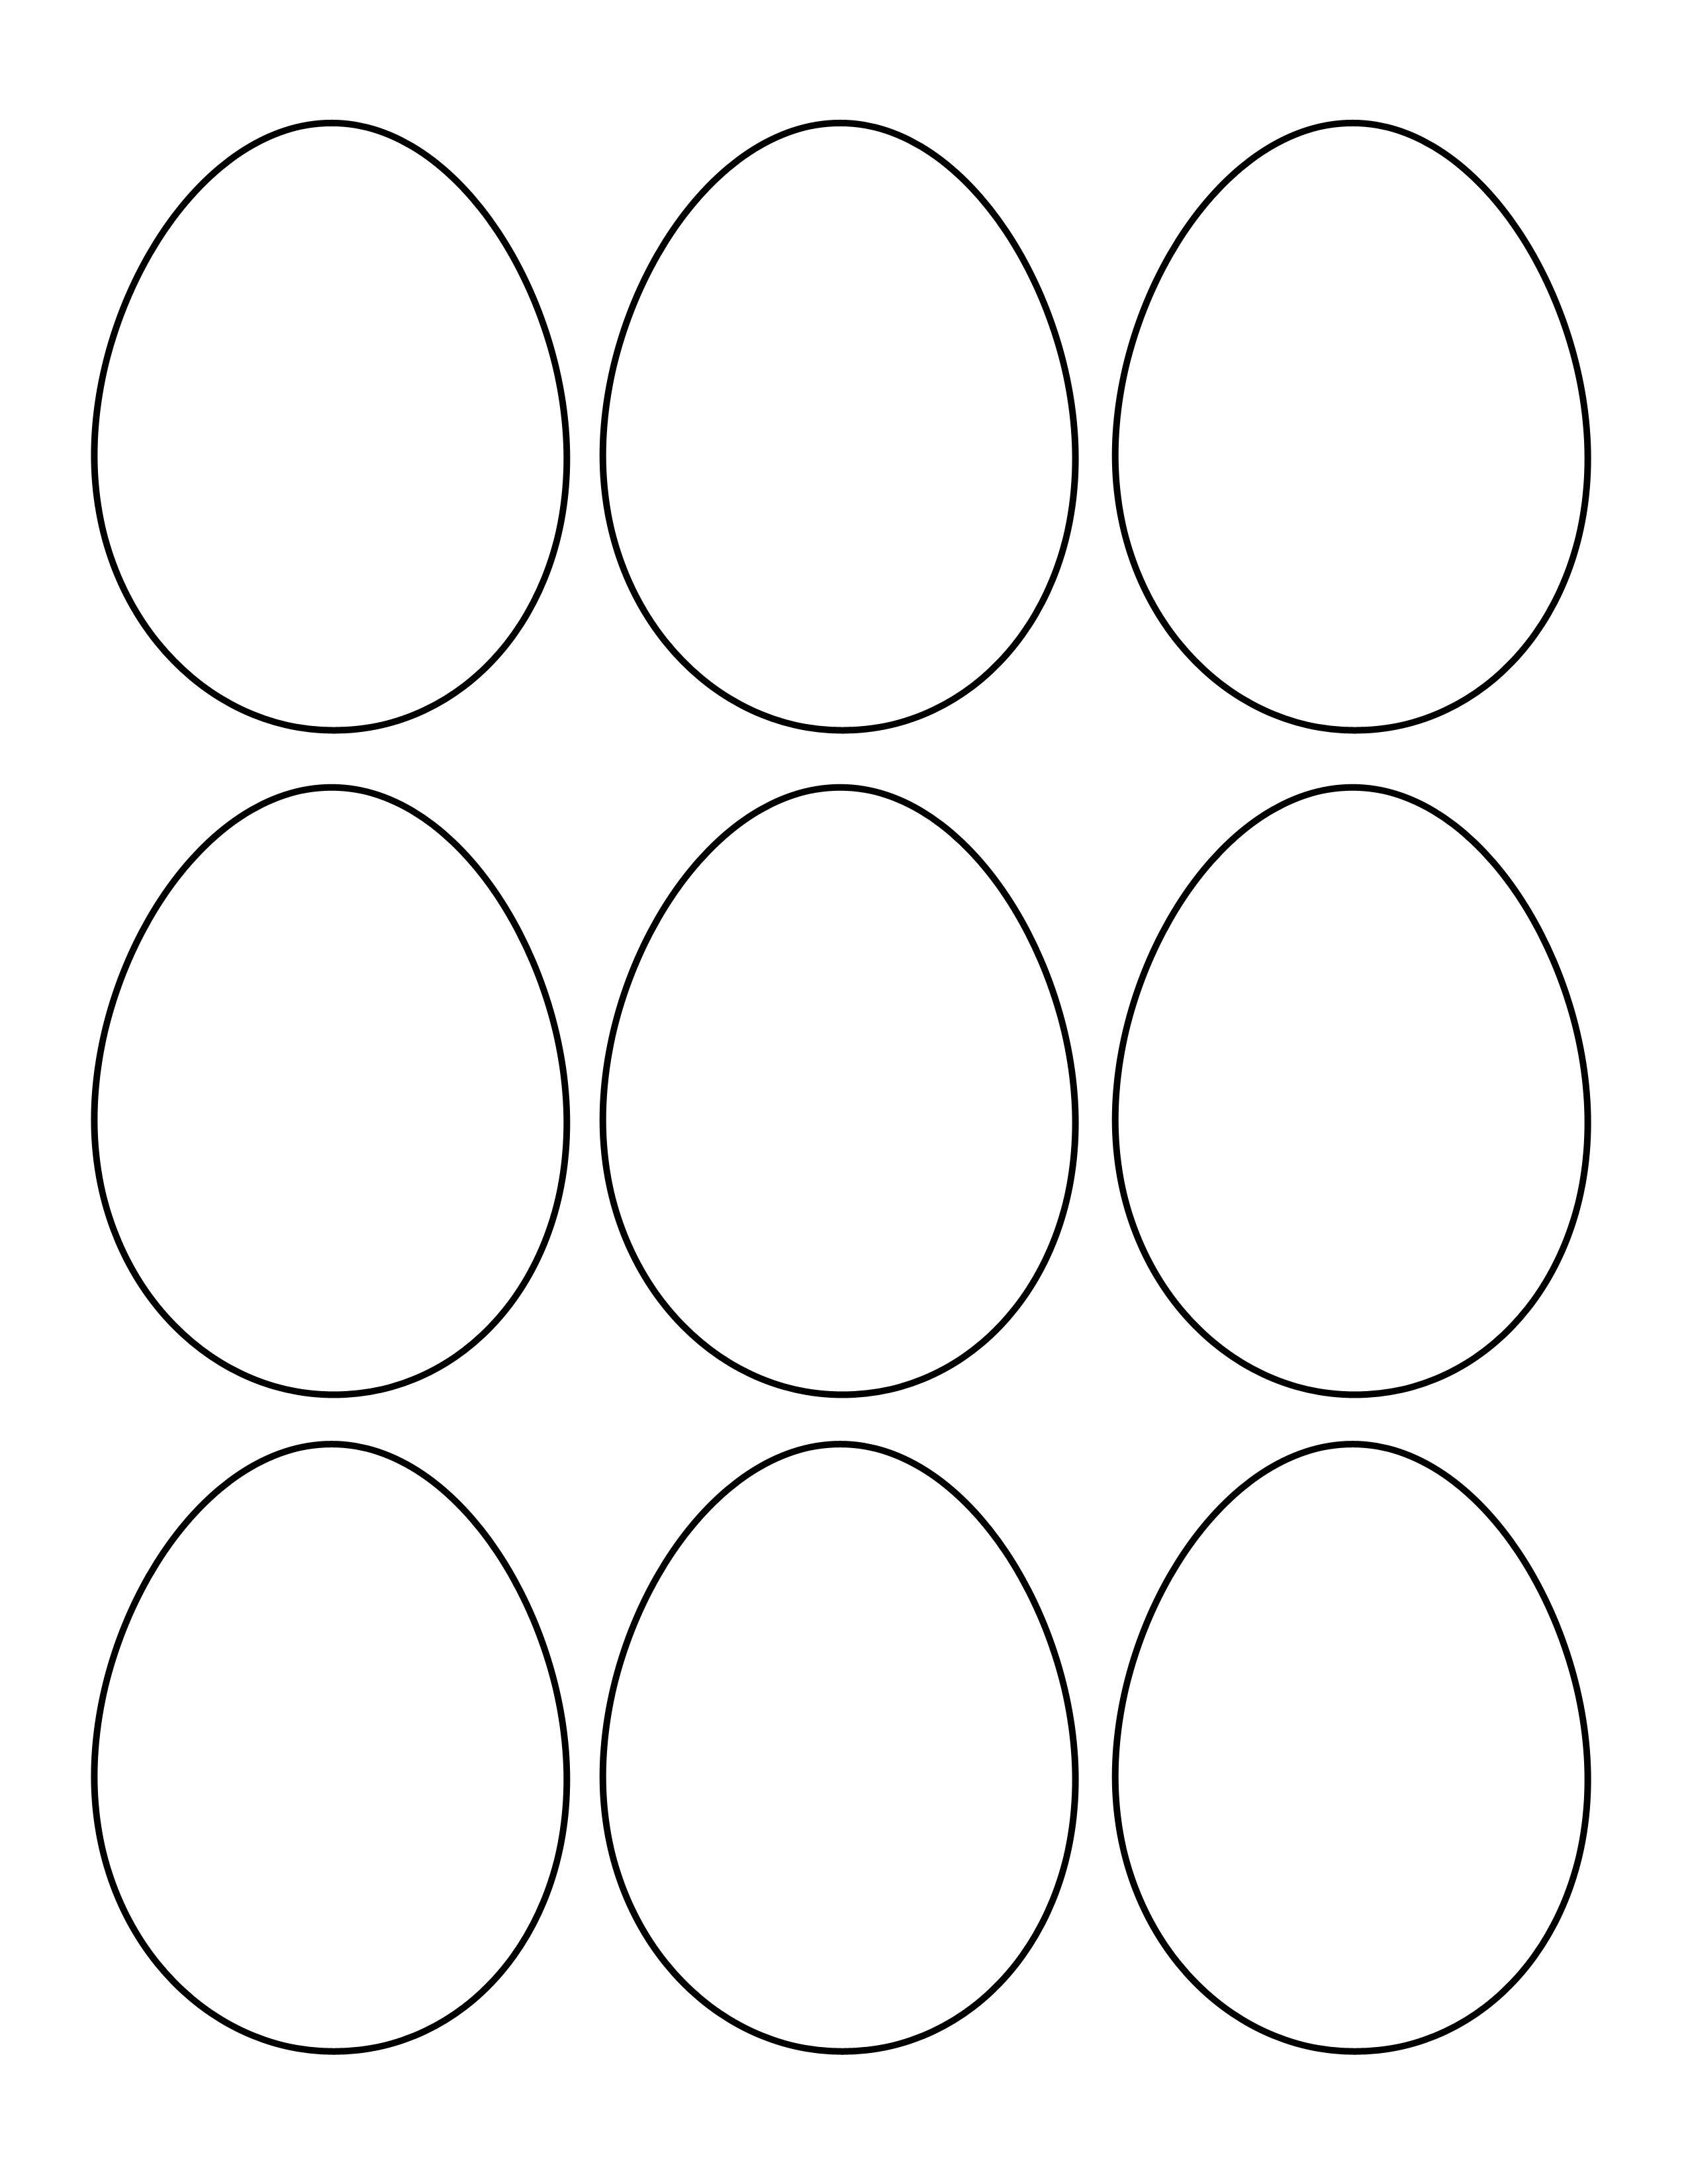 Free Printable Easter Egg Templates – Hd Easter Images - Easter Egg Template Free Printable